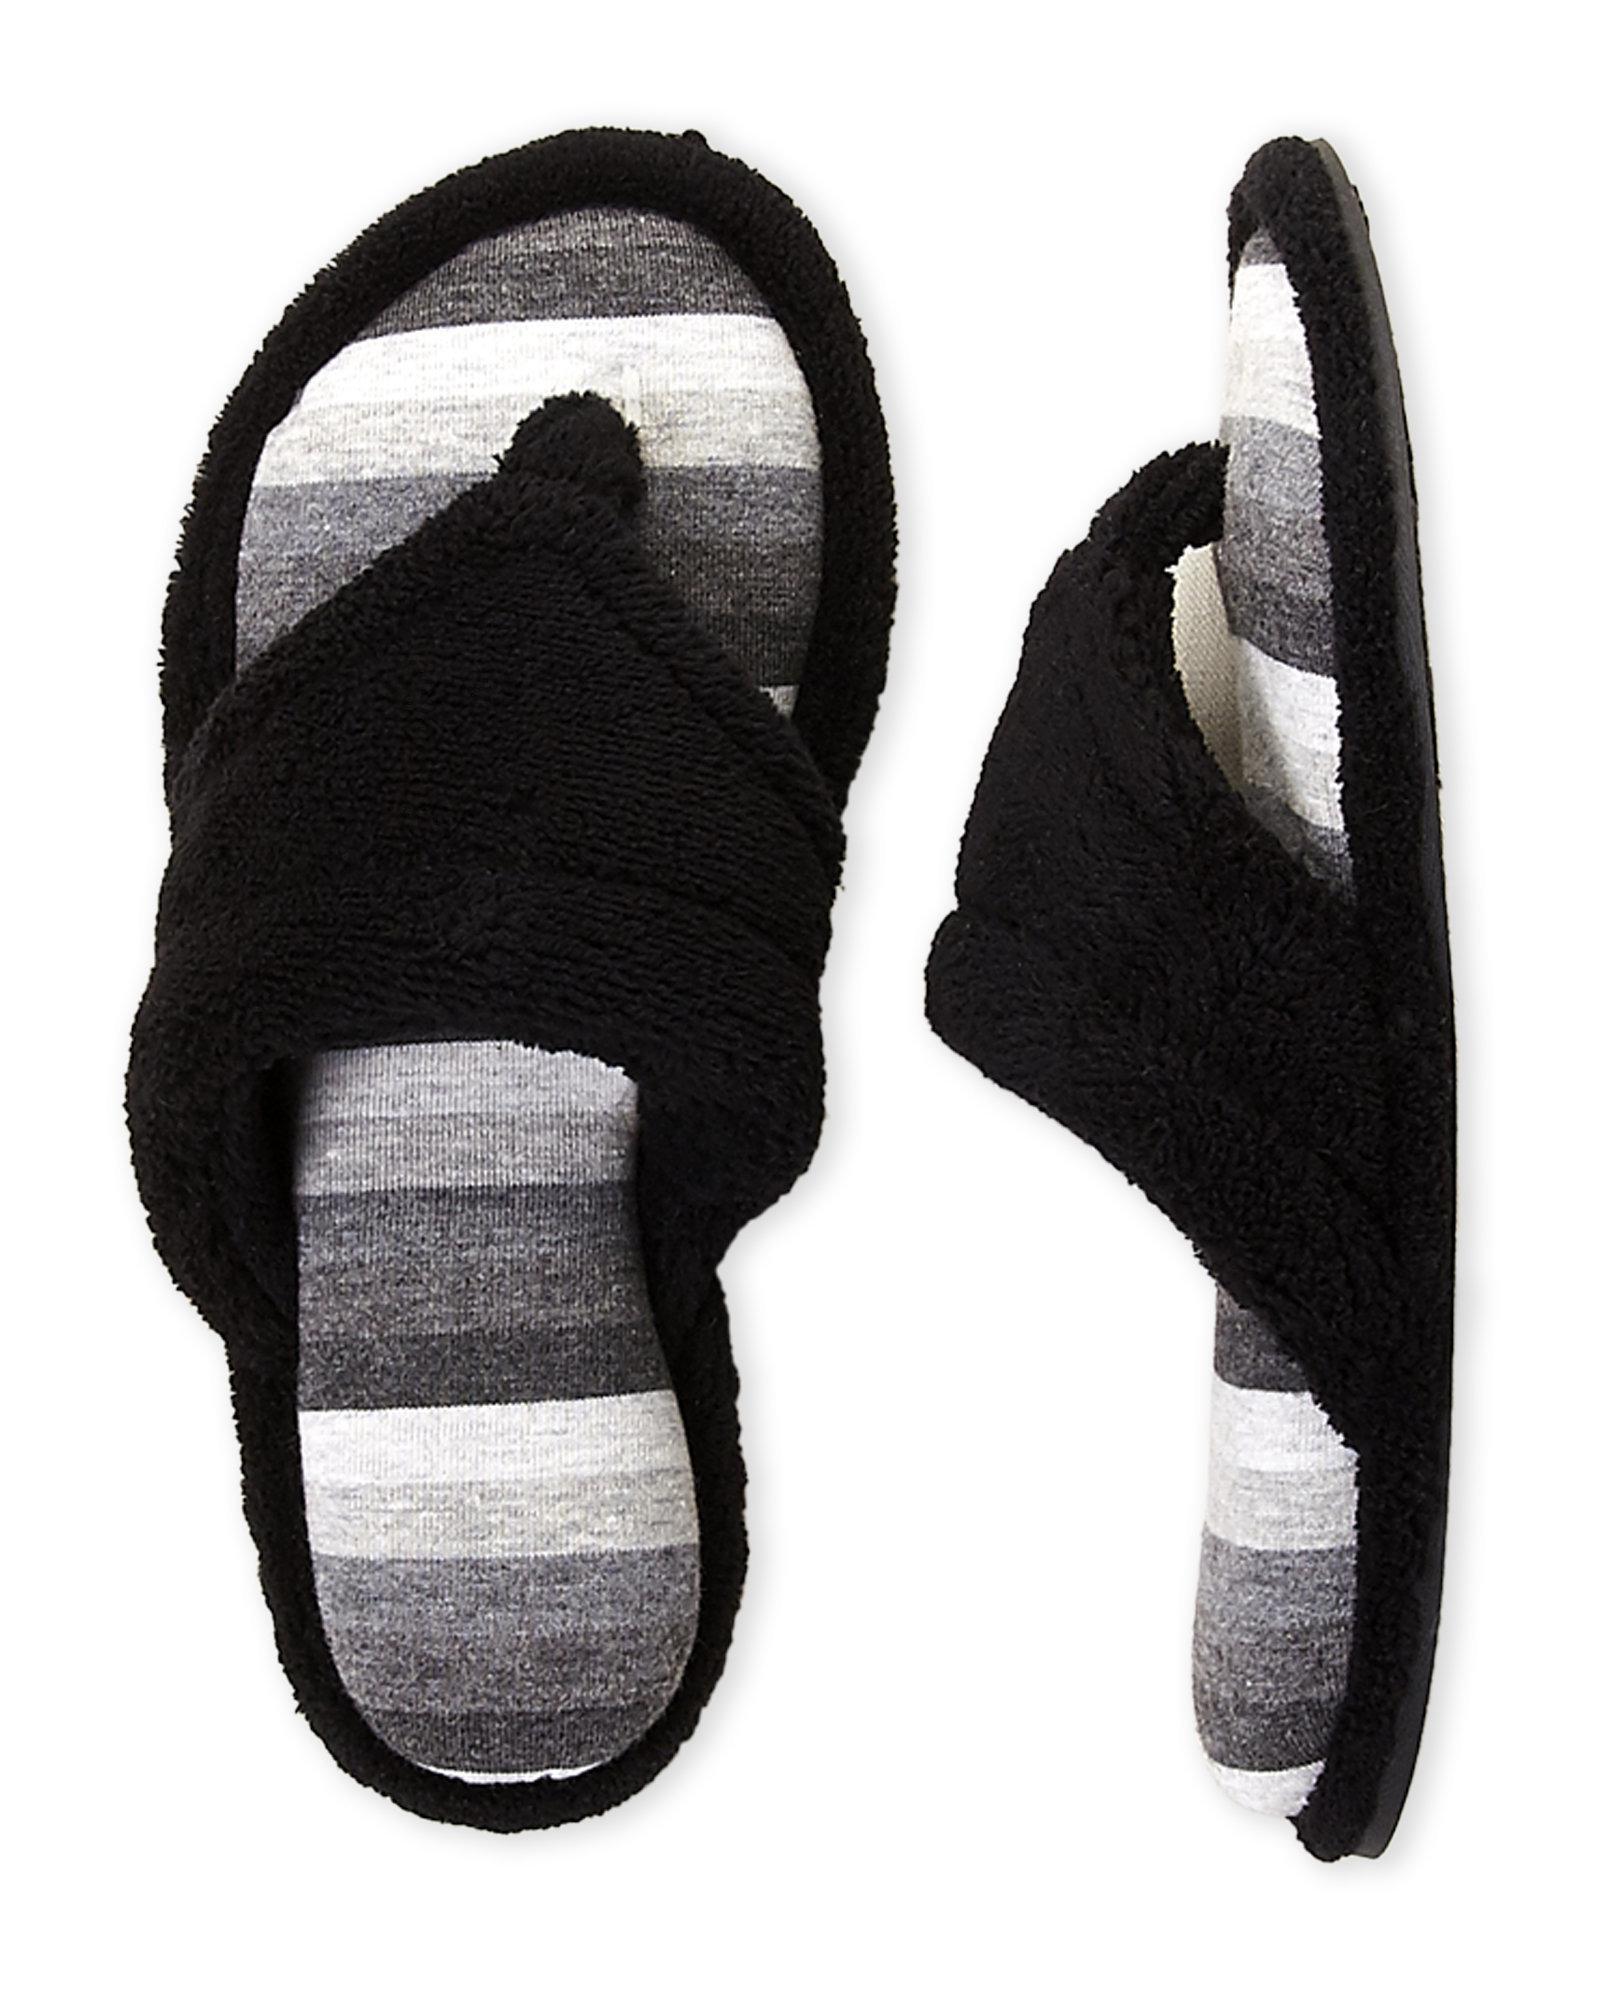 9e95a20c2f8 Lyst - Dearfoams Terry Cloth Thong Slippers in Black